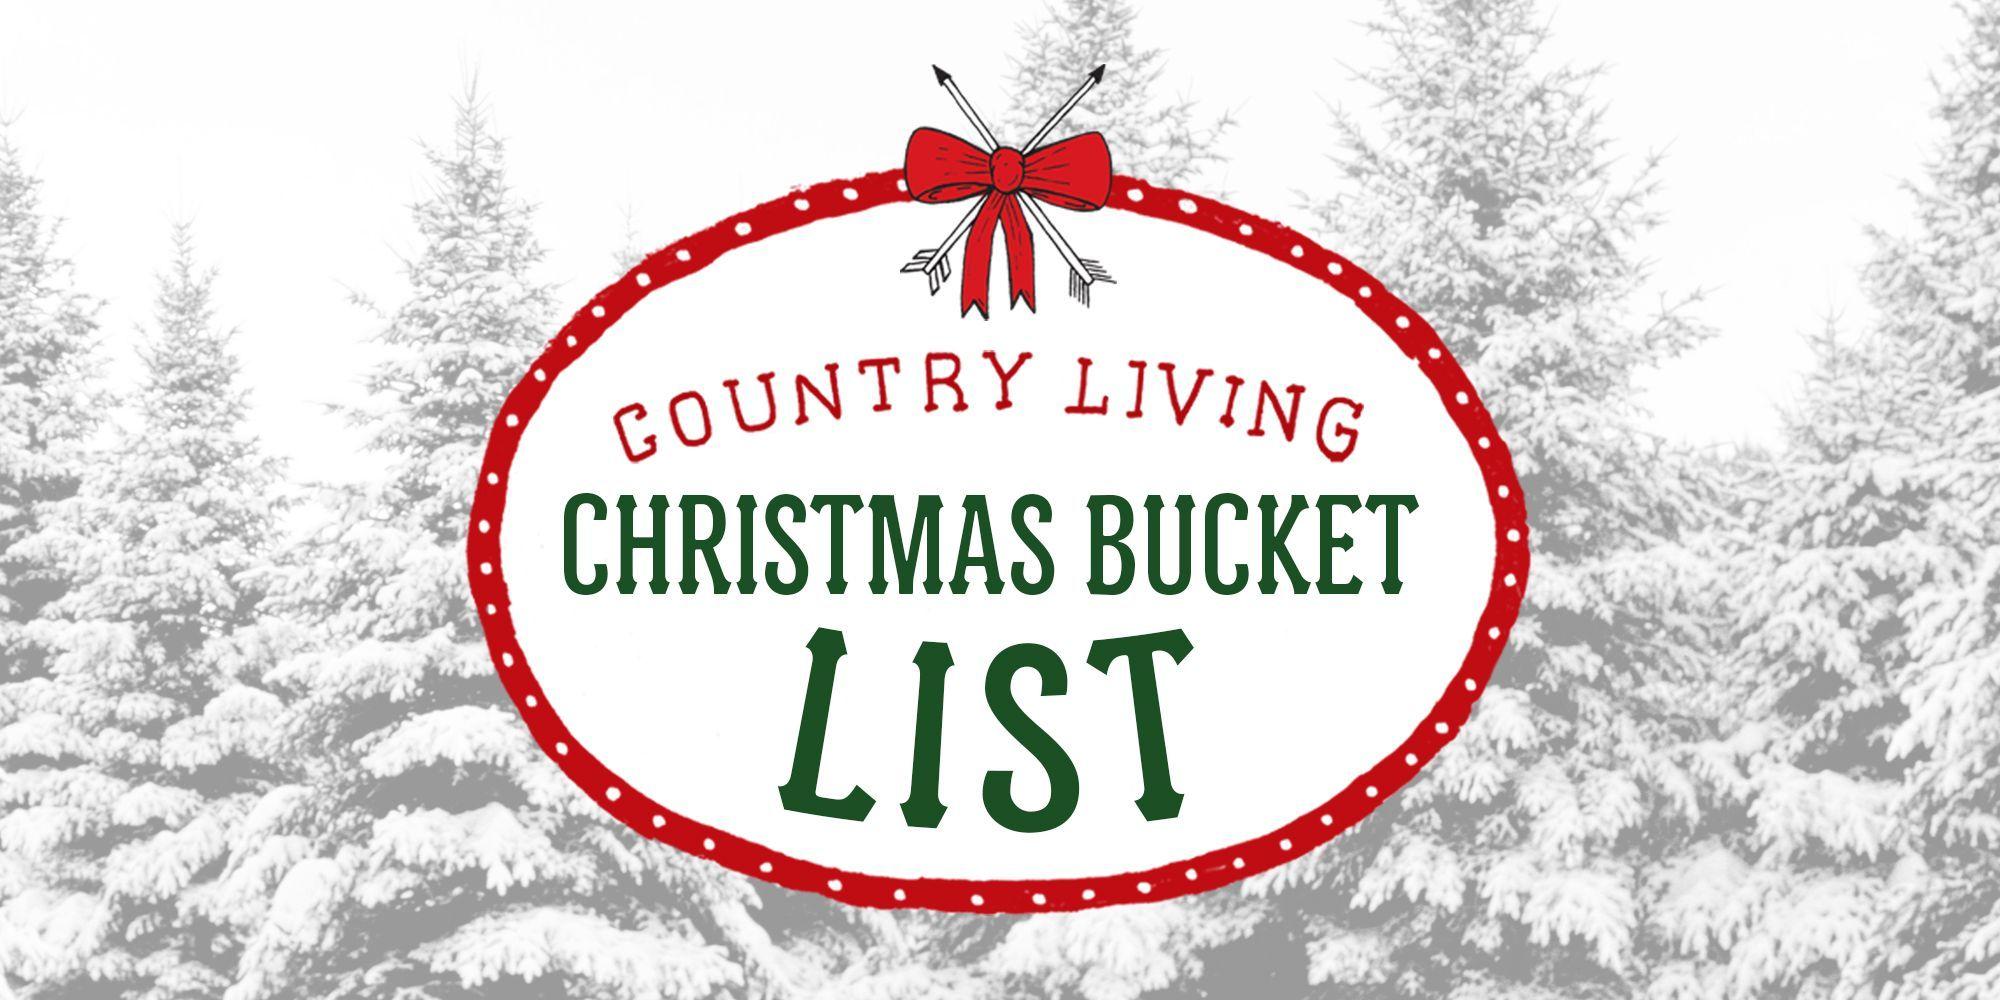 37 Fun Christmas Activities , Christmas Bucket List Ideas